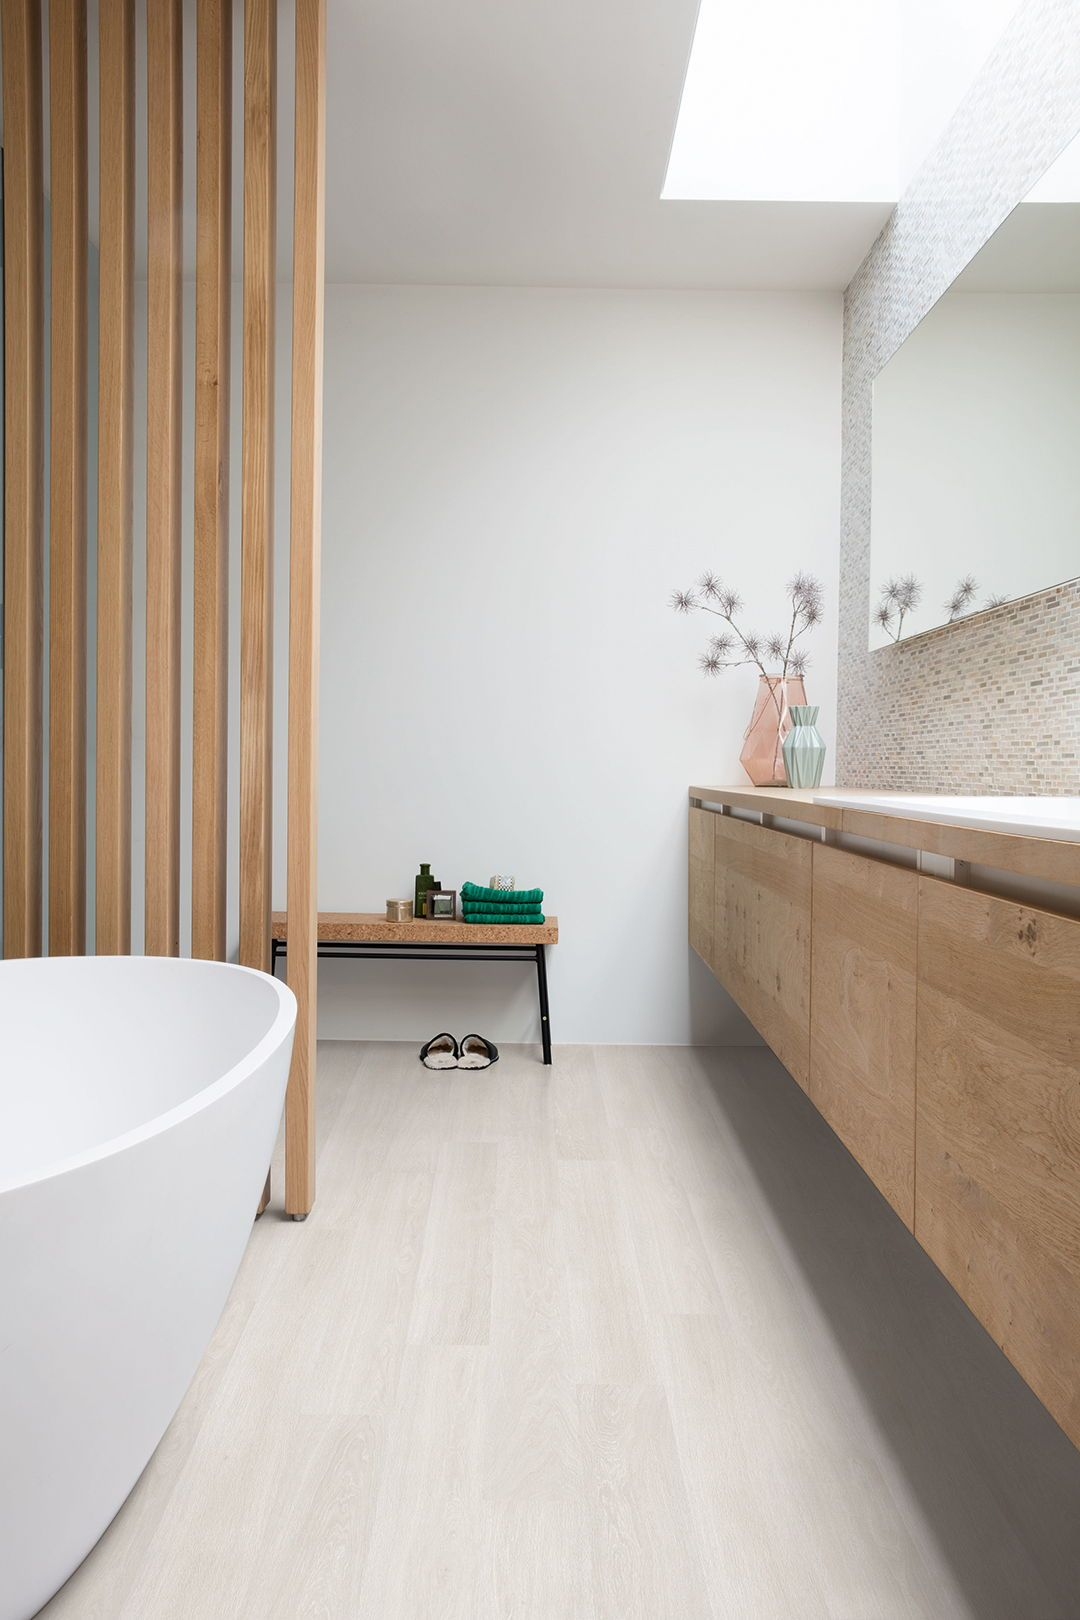 Choose The Perfect Bathroom Floor Quick Step Co Uk Laminate Flooring Bathroom Vinyl Plank Flooring Bathroom Vinyl Flooring Bathroom